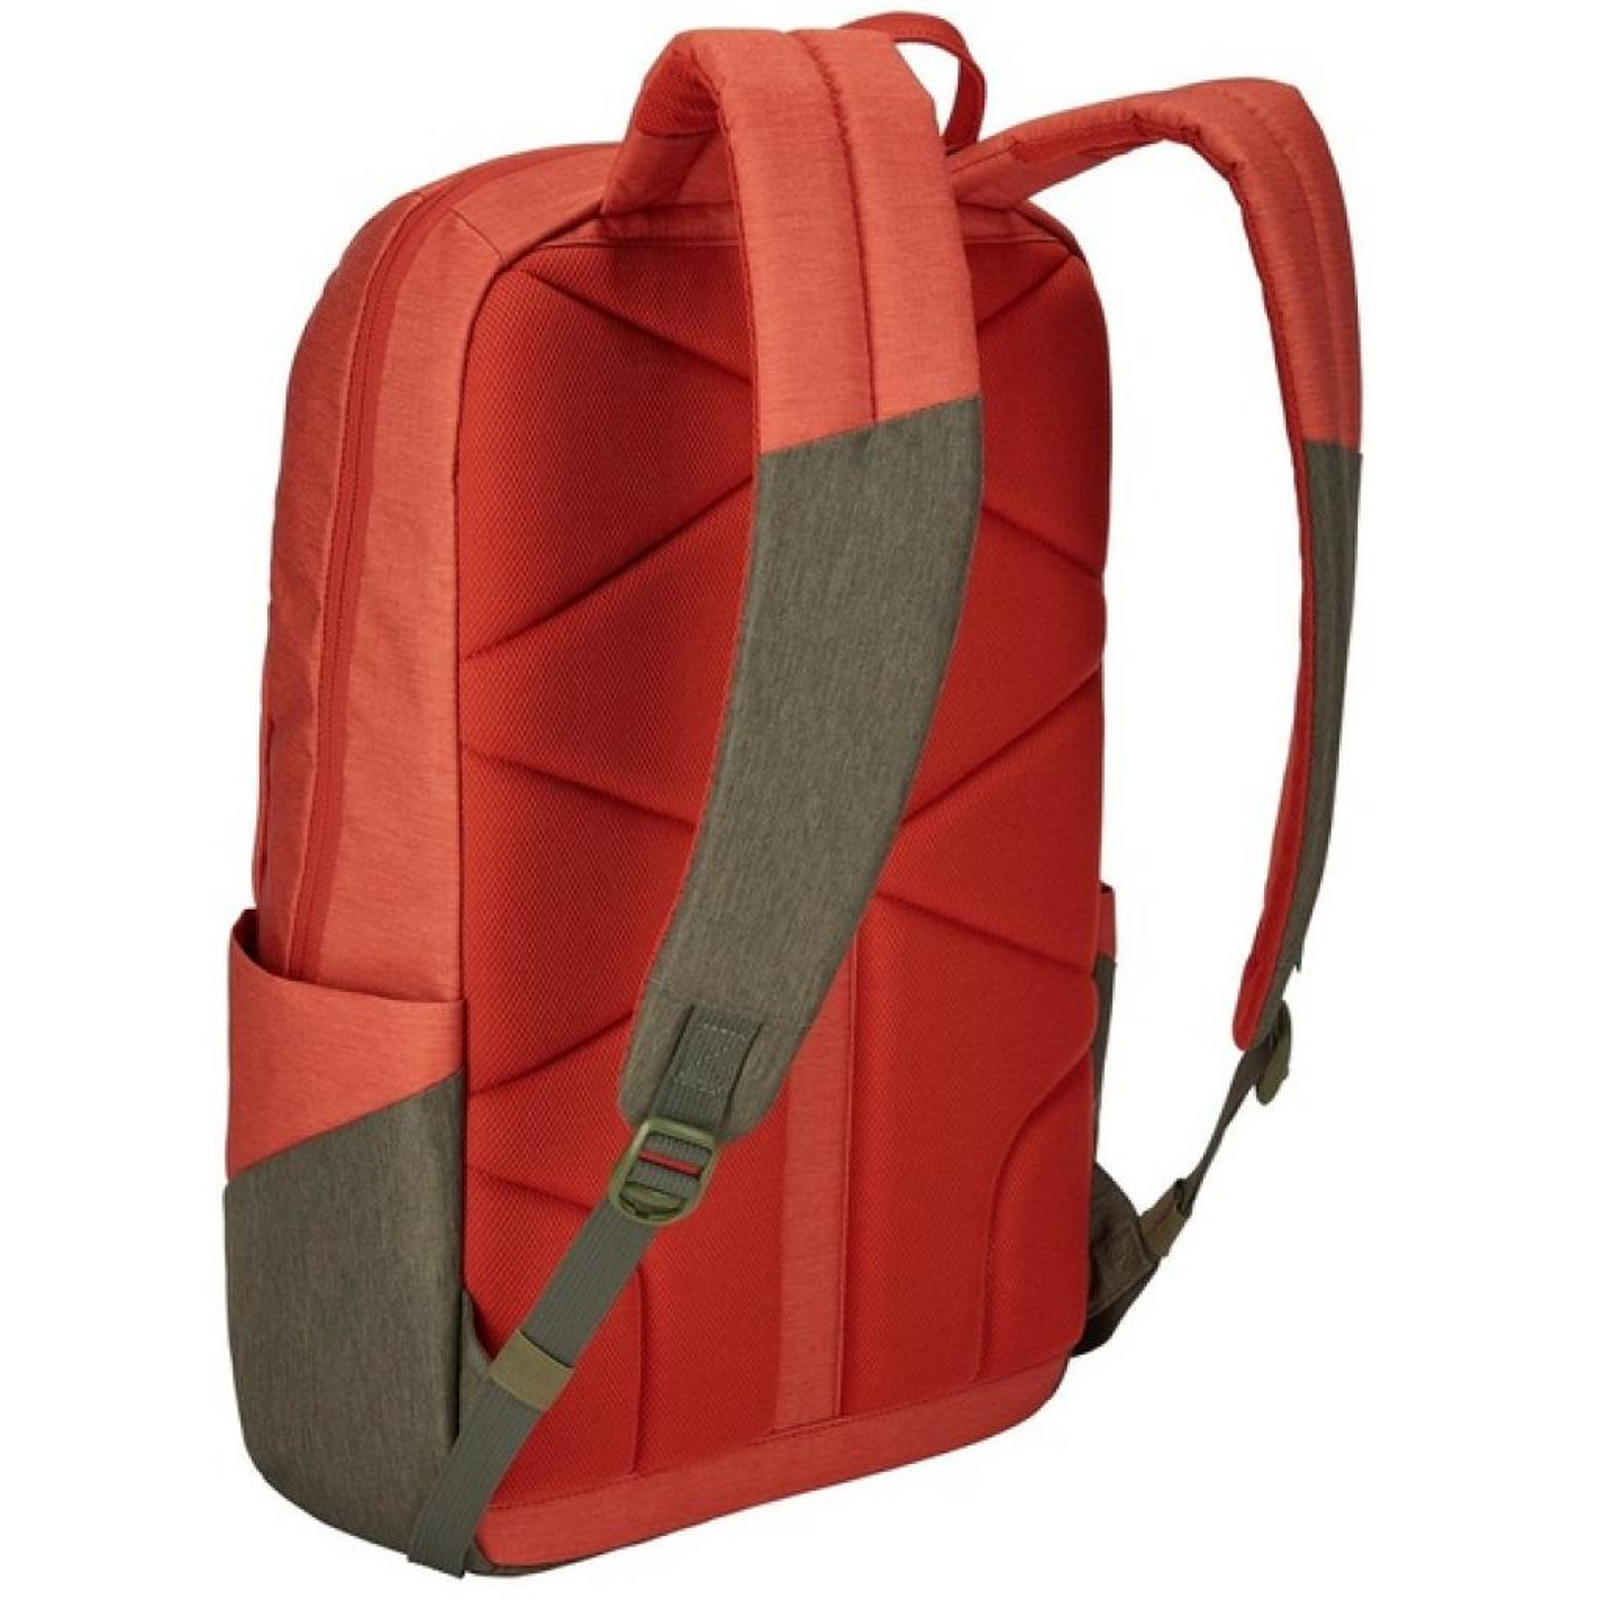 "Рюкзак для ноутбука Thule 15"" Lithos 20L Rooibos/Forest Night TLBP-116 (3203824) изображение 2"